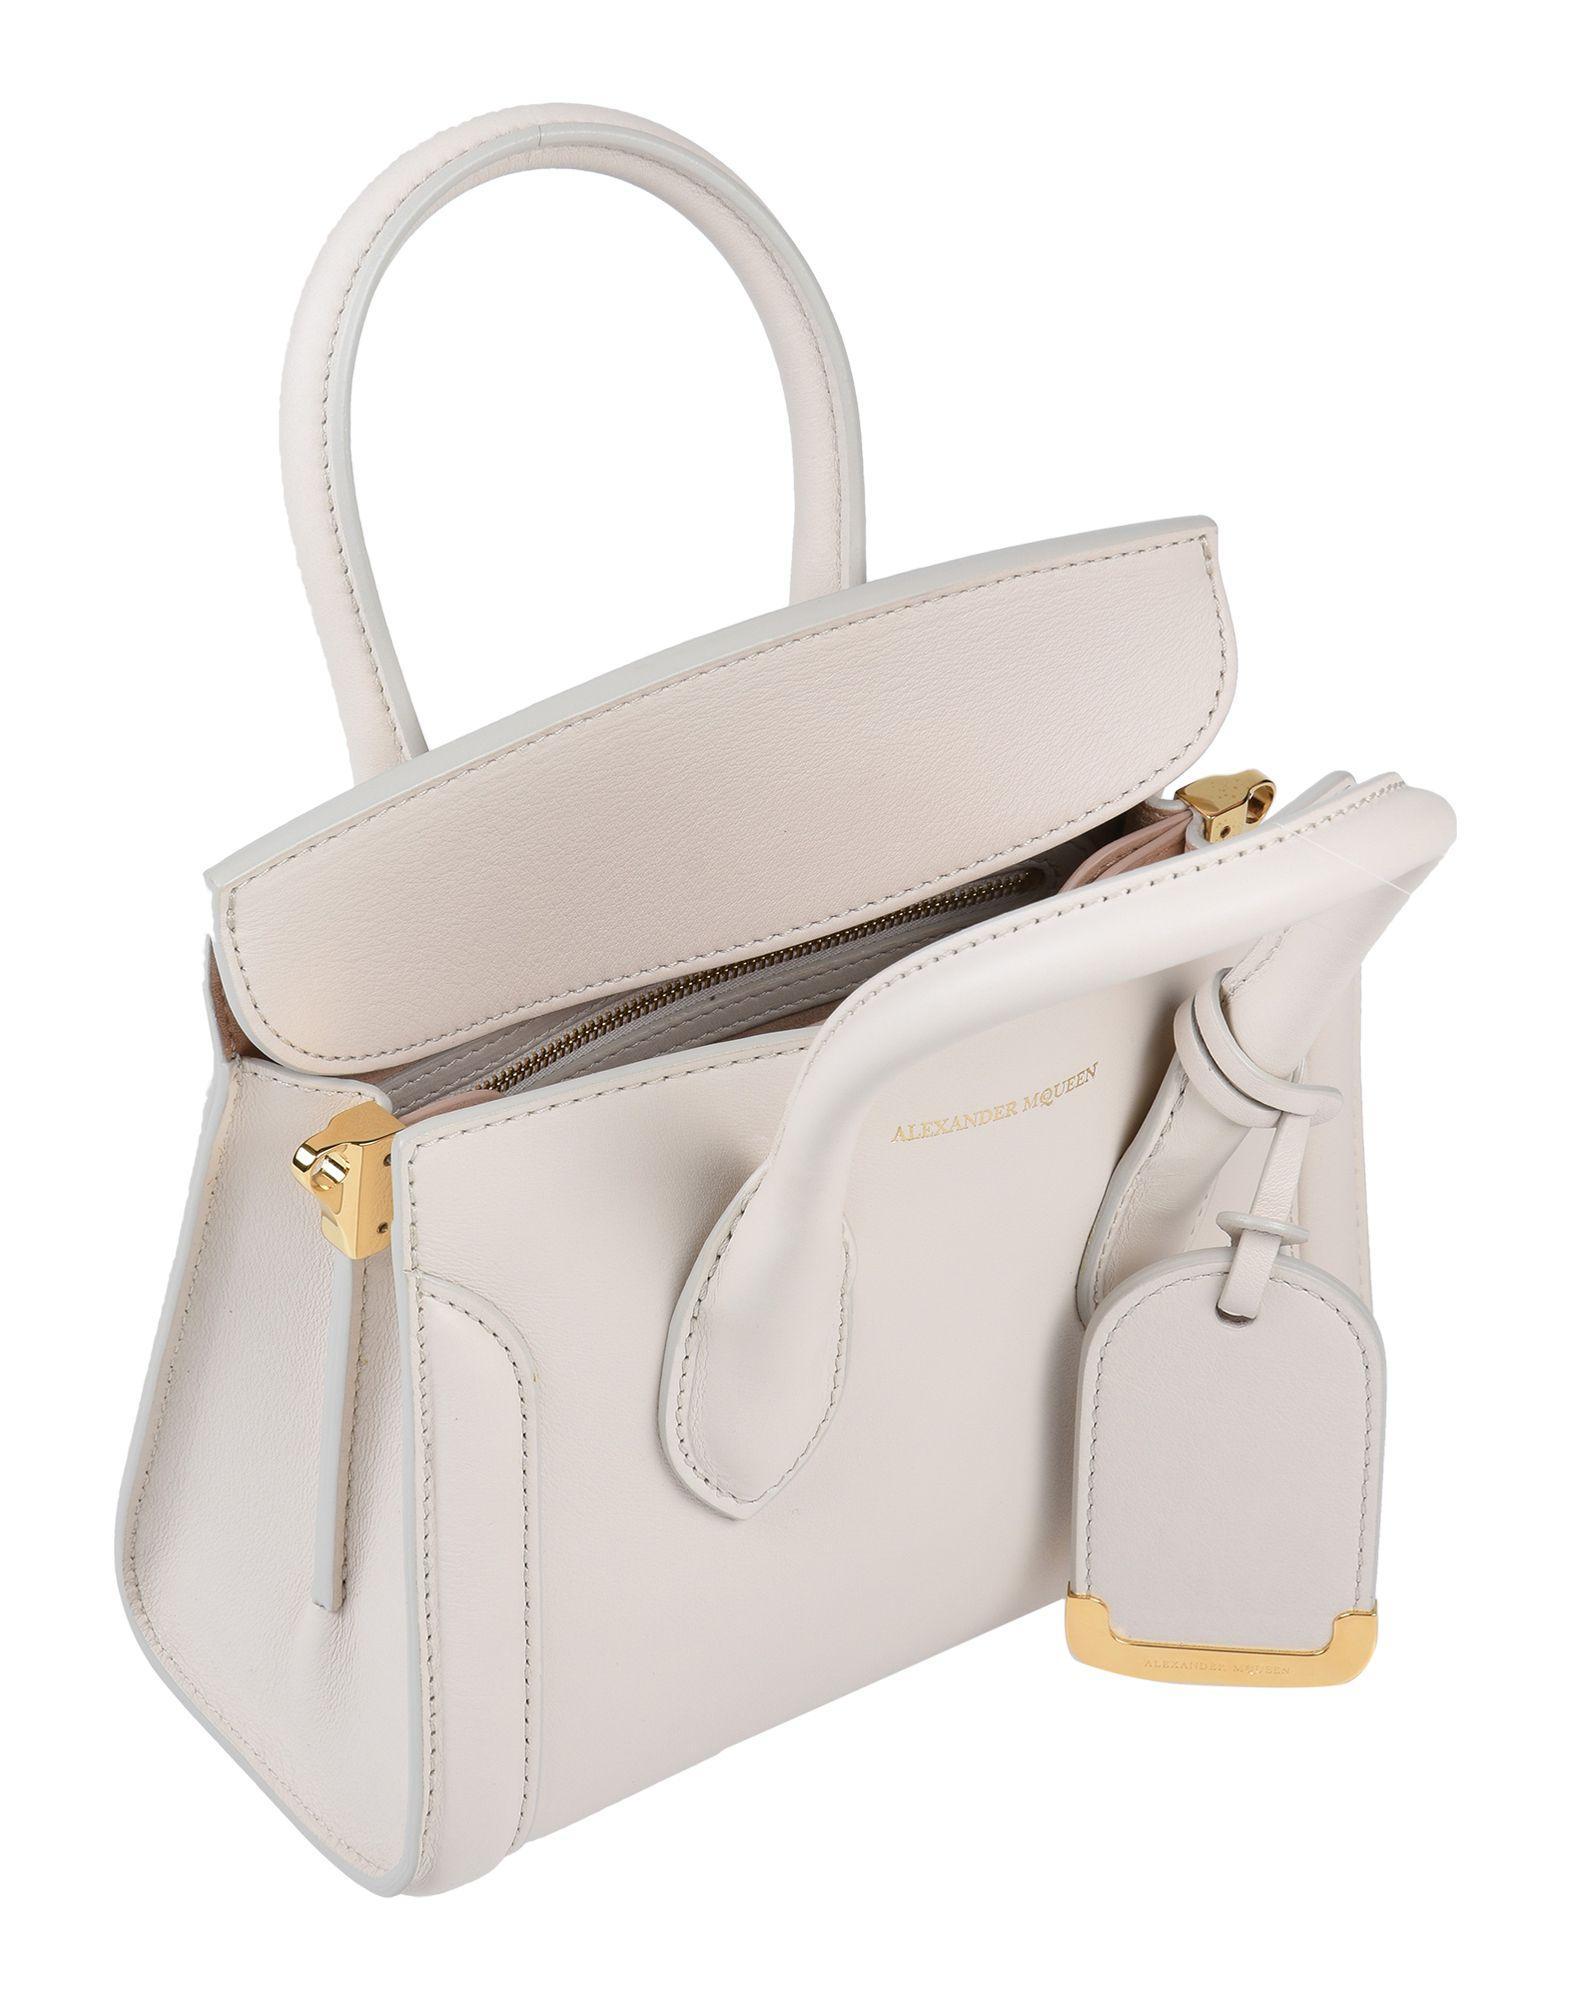 Alexander McQueen Handtaschen in Weiß x18Kj